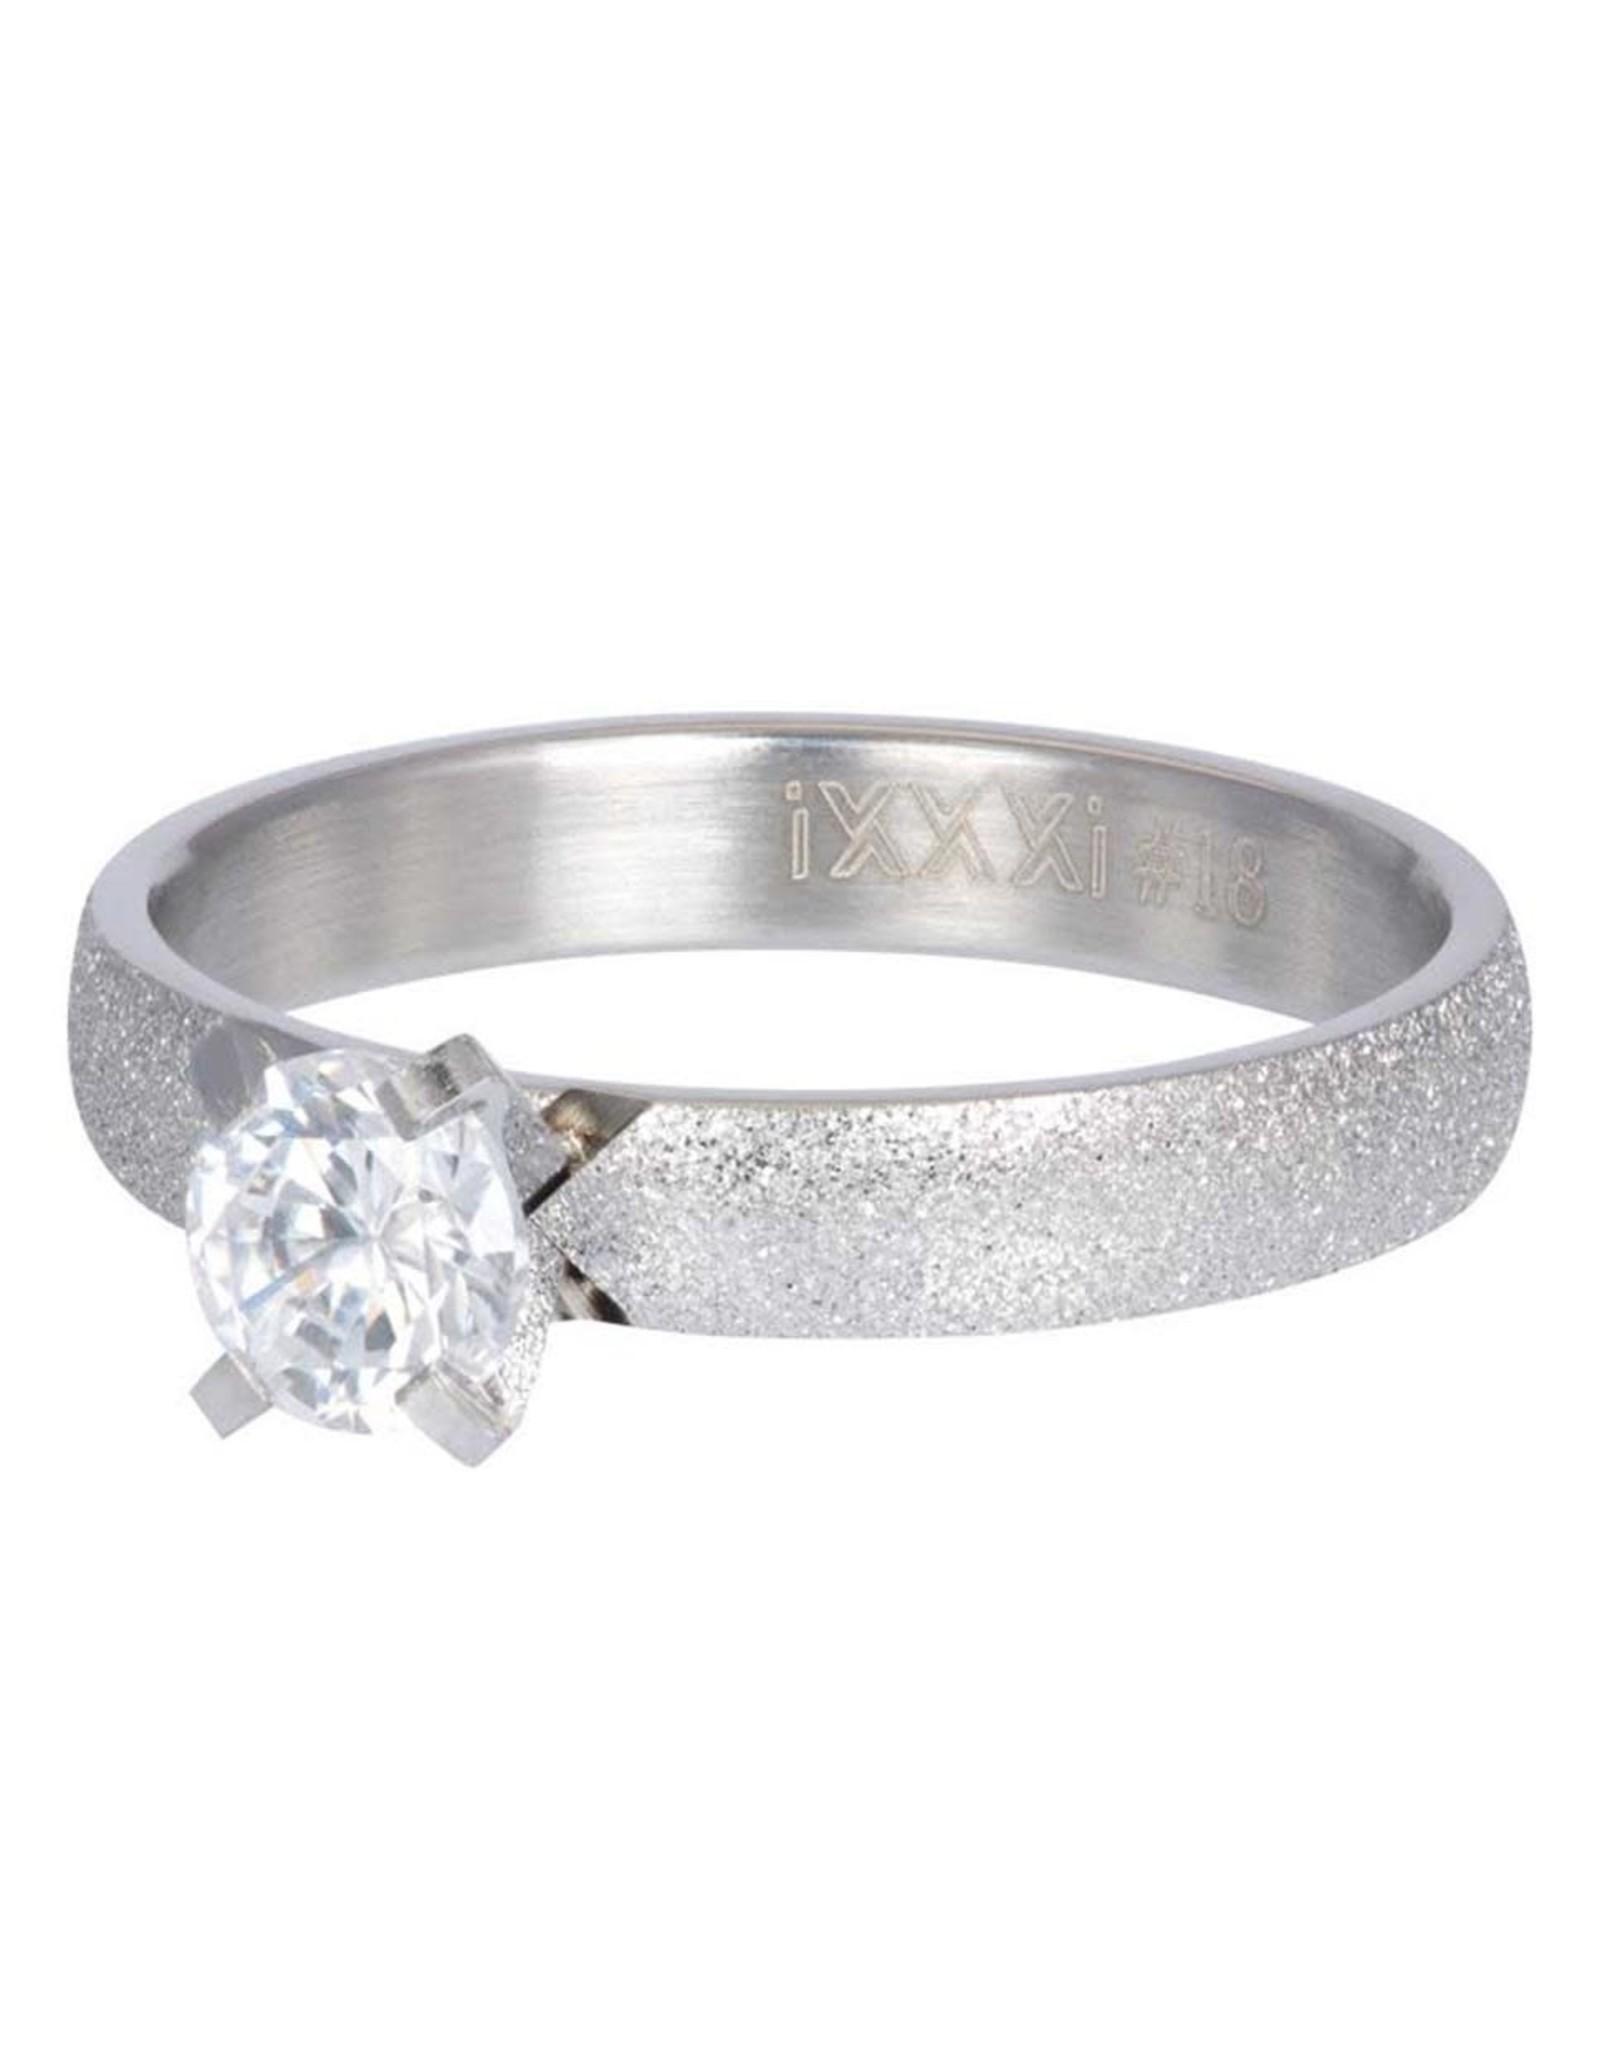 iXXXi Jewelry iXXXi vulring Estelle